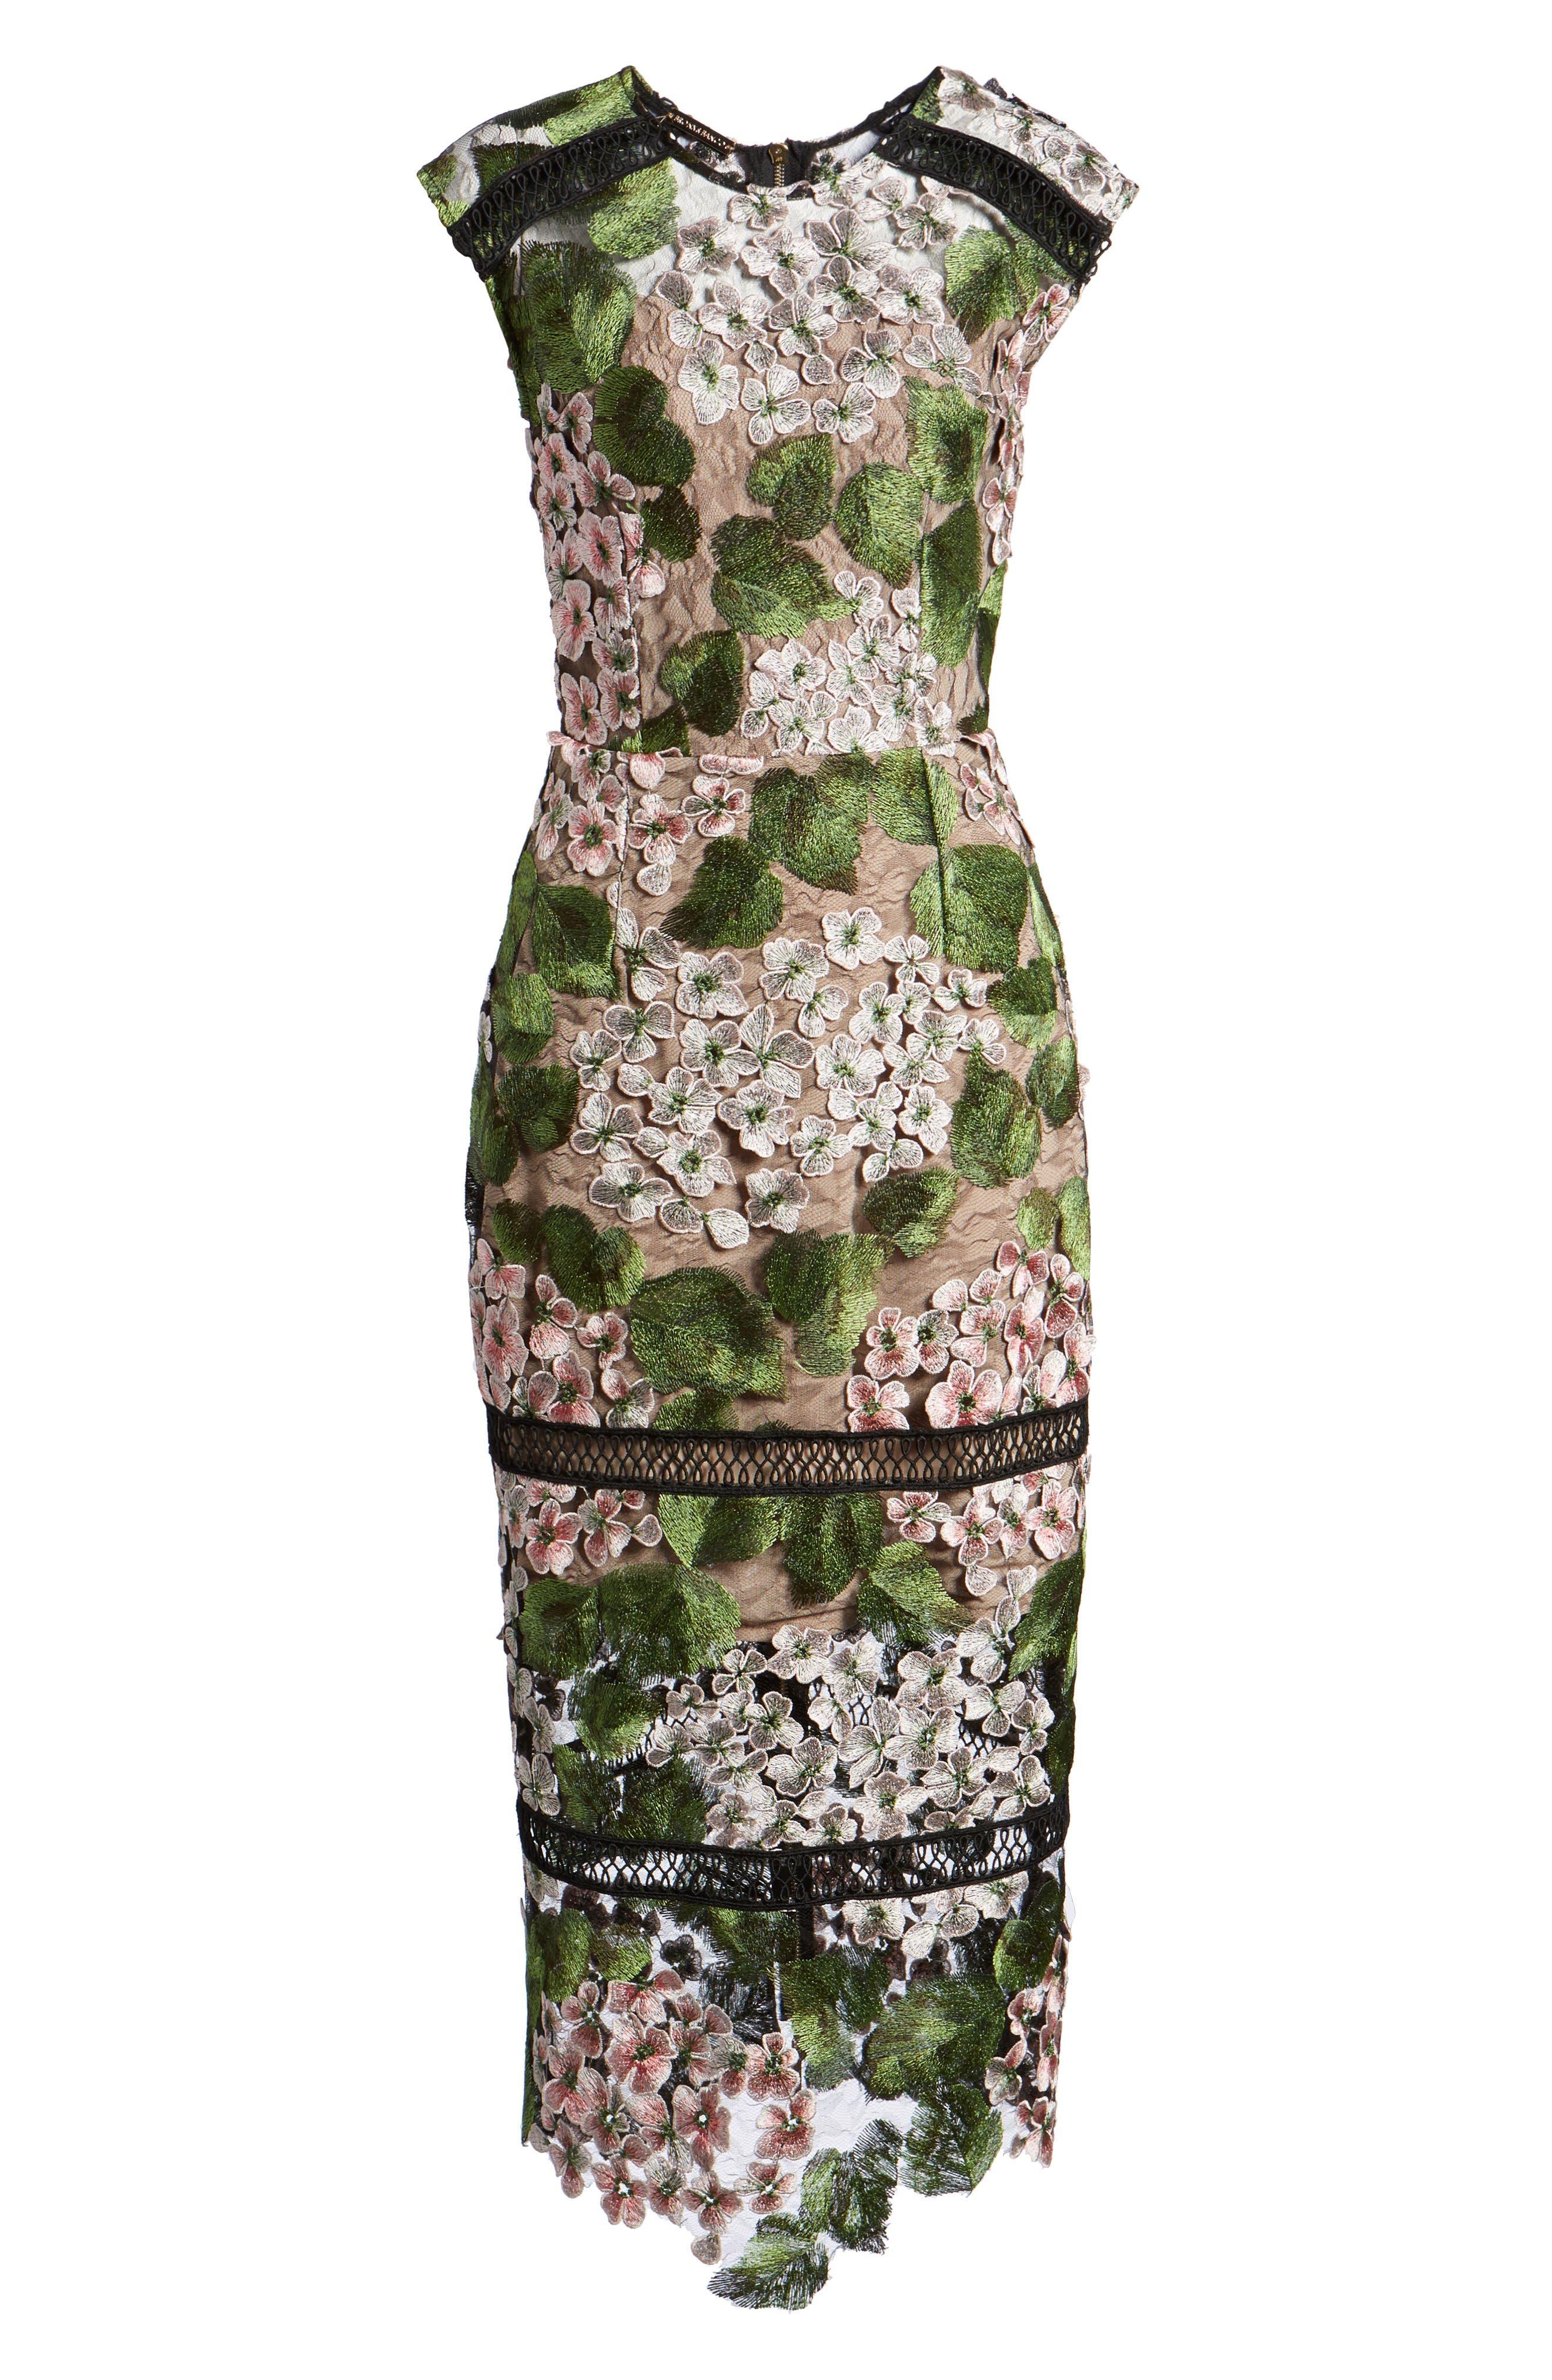 Cherry Hydrangea Lace Dress,                             Alternate thumbnail 6, color,                             Multicolor Pink